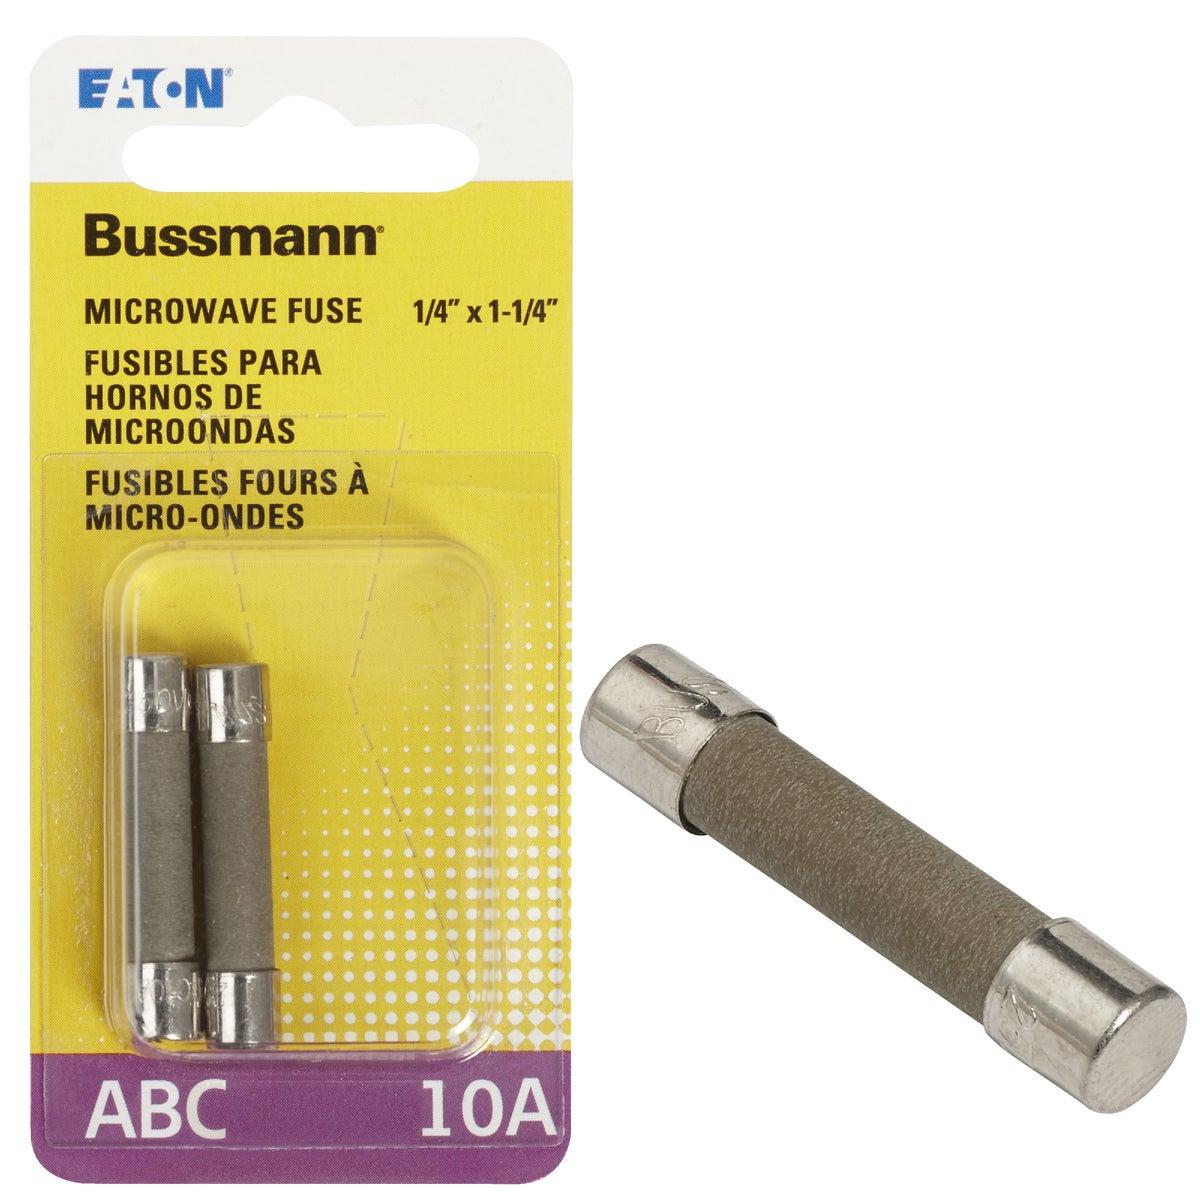 Bussmann ABC Electronic Fuse